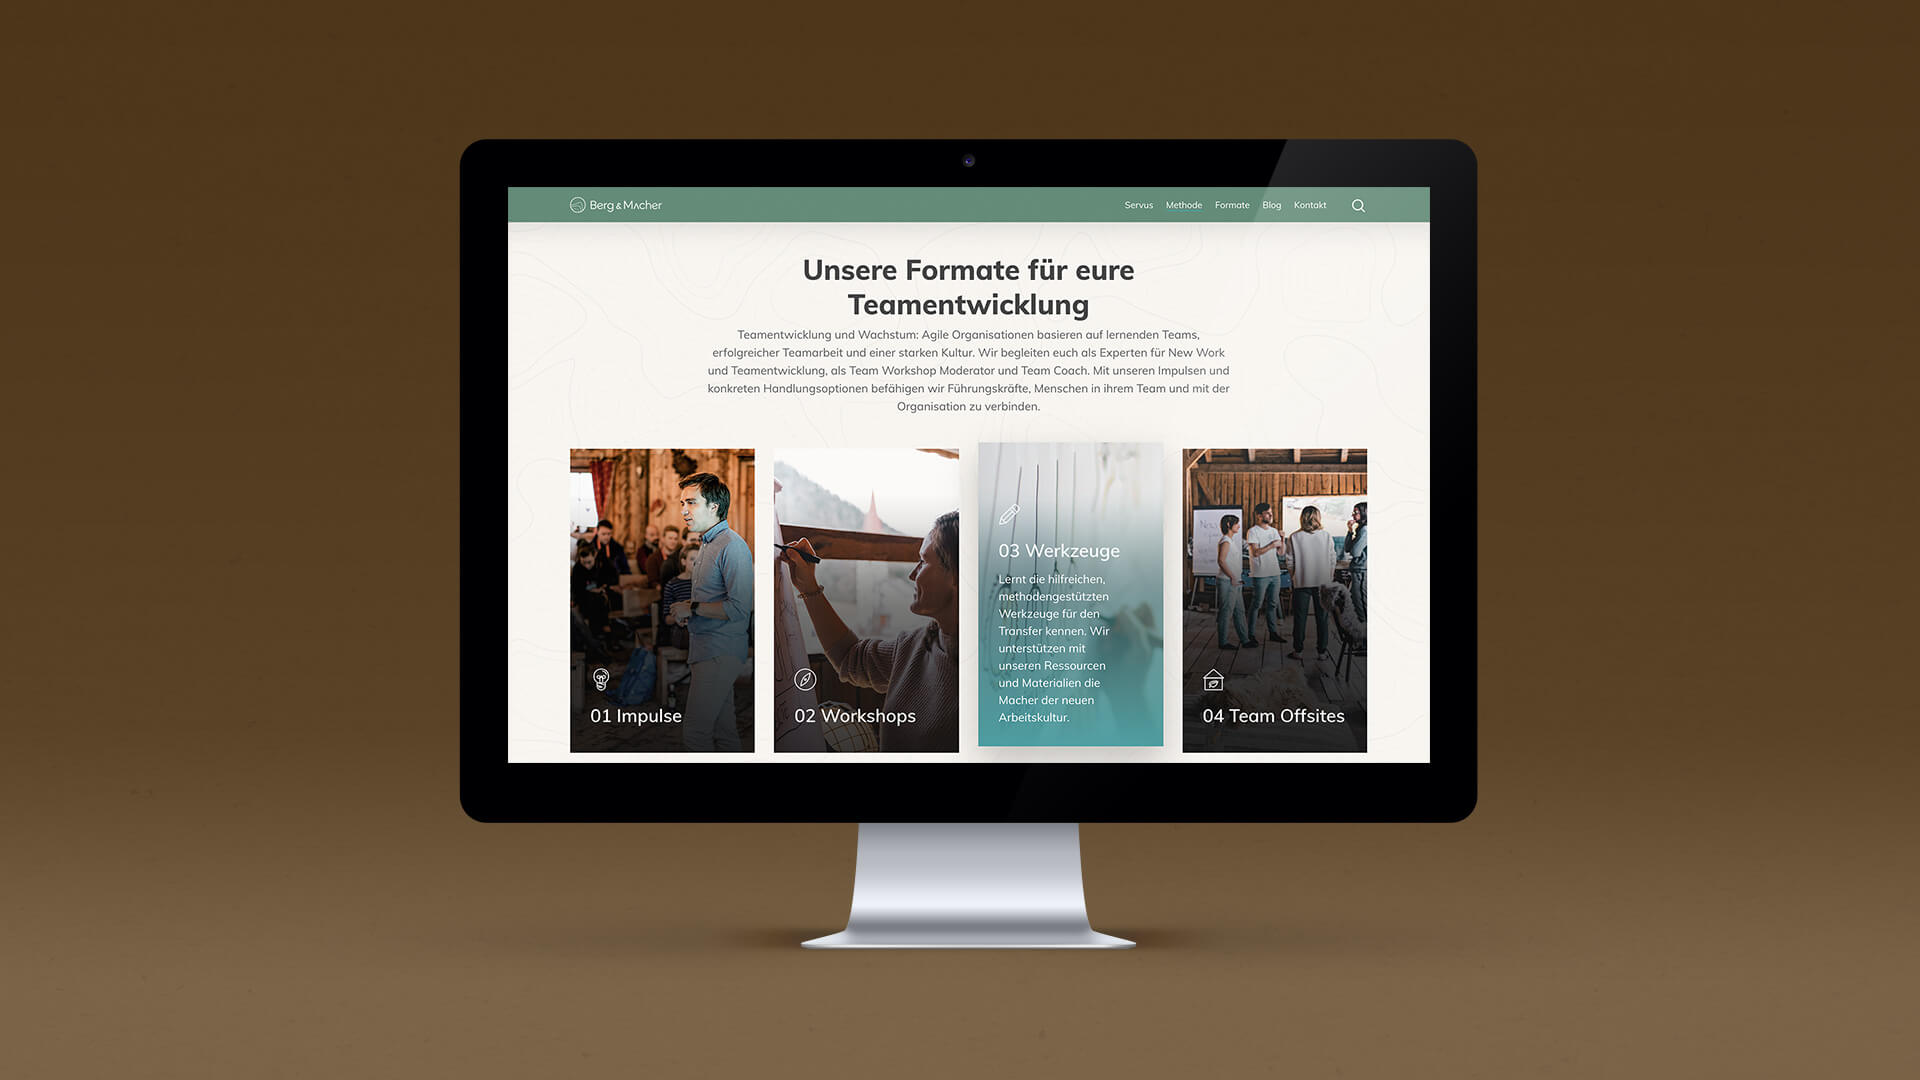 Mockup on iMac of the Berg und Macher Page